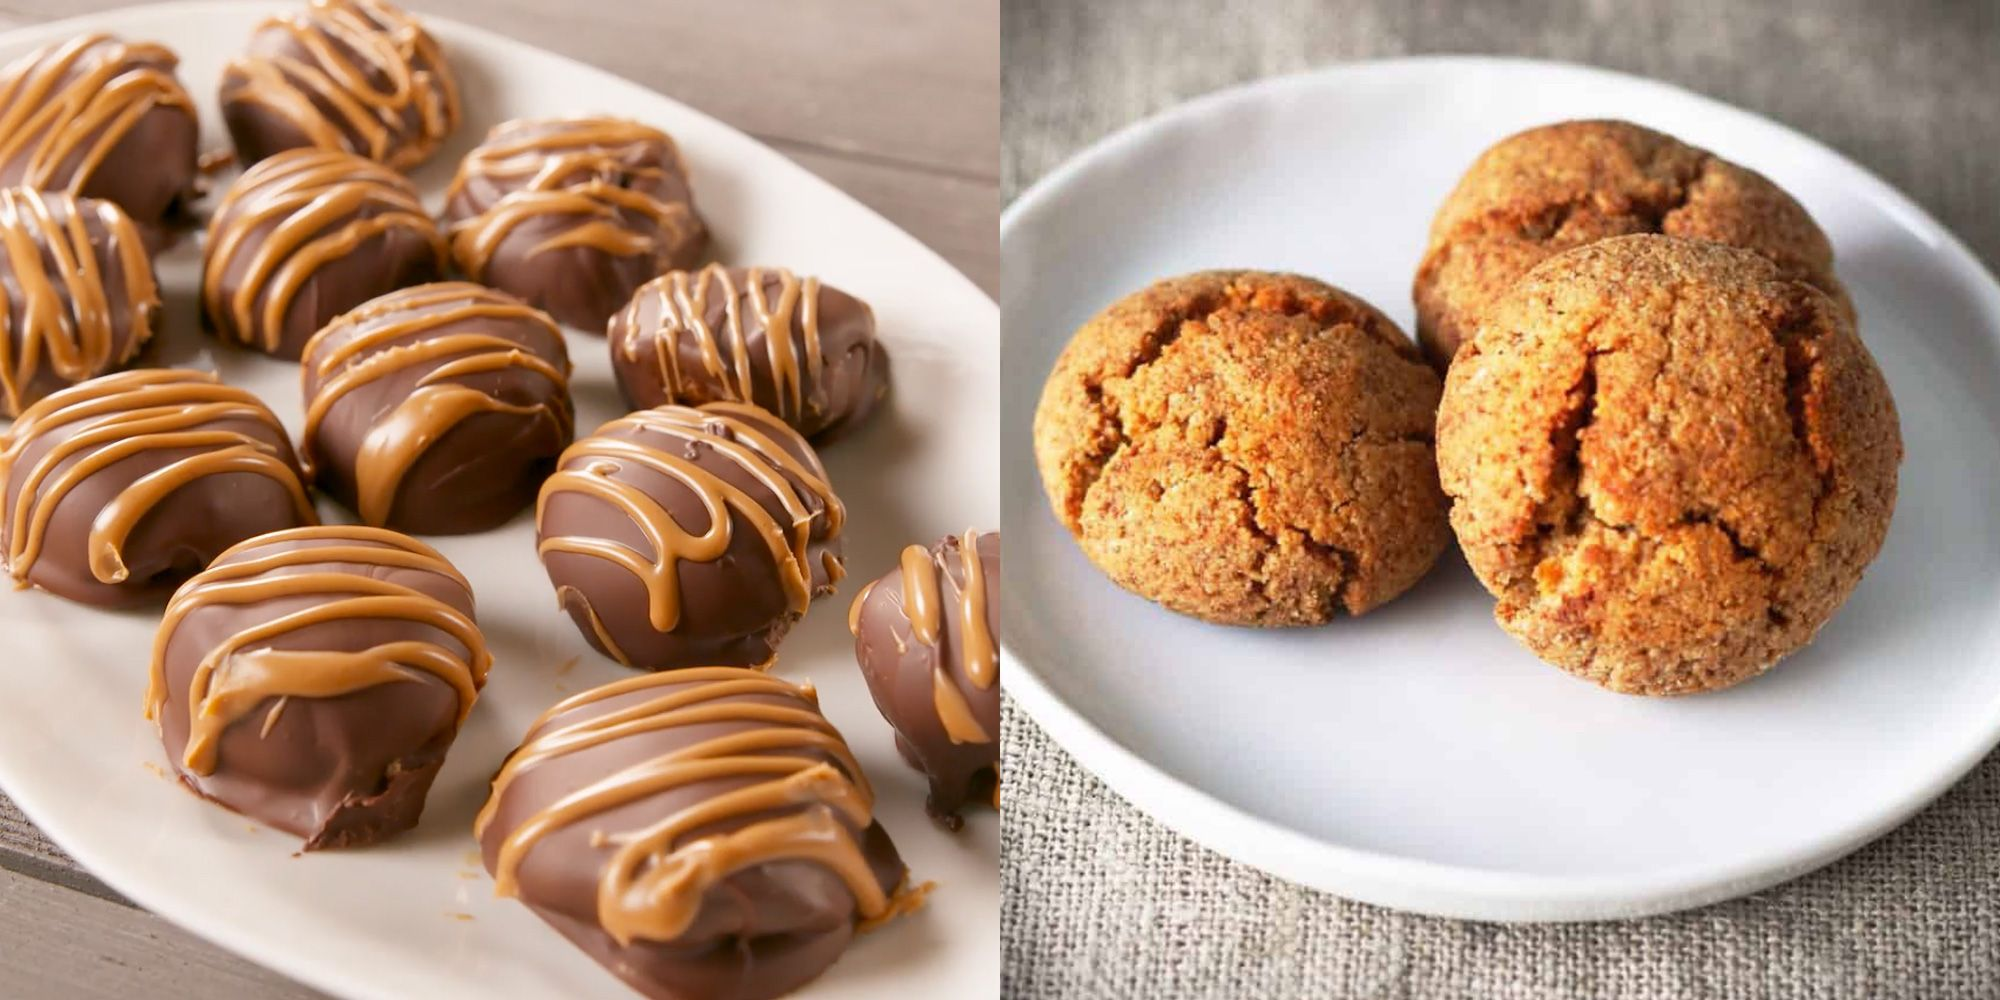 20 Keto Dessert Recipes , Desserts To Eat On The Keto Diet